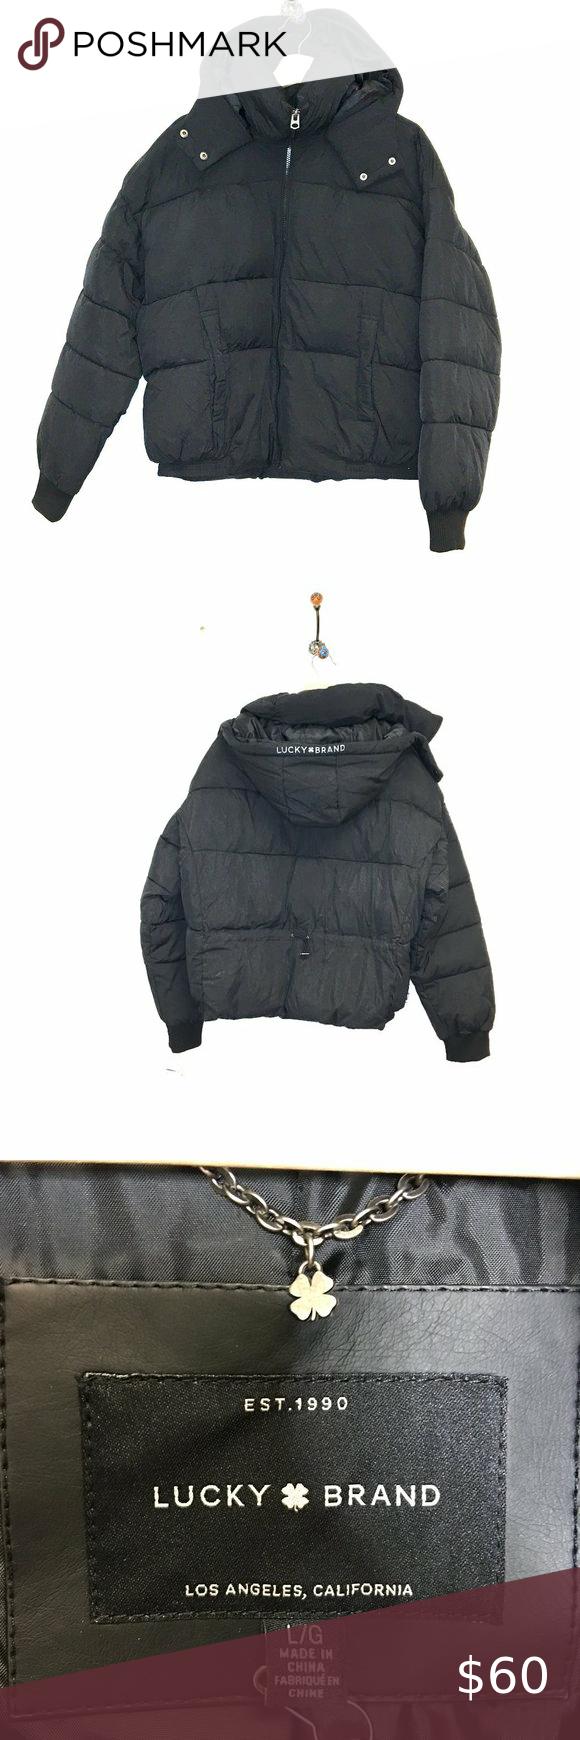 Nwt Black Lucky Brand Missy Short Puffer Jacket L Size L Large Color Black Specifics Shorter Length Sli Short Puffer Jacket Lucky Brand Puffer Jacket Black [ 1740 x 580 Pixel ]